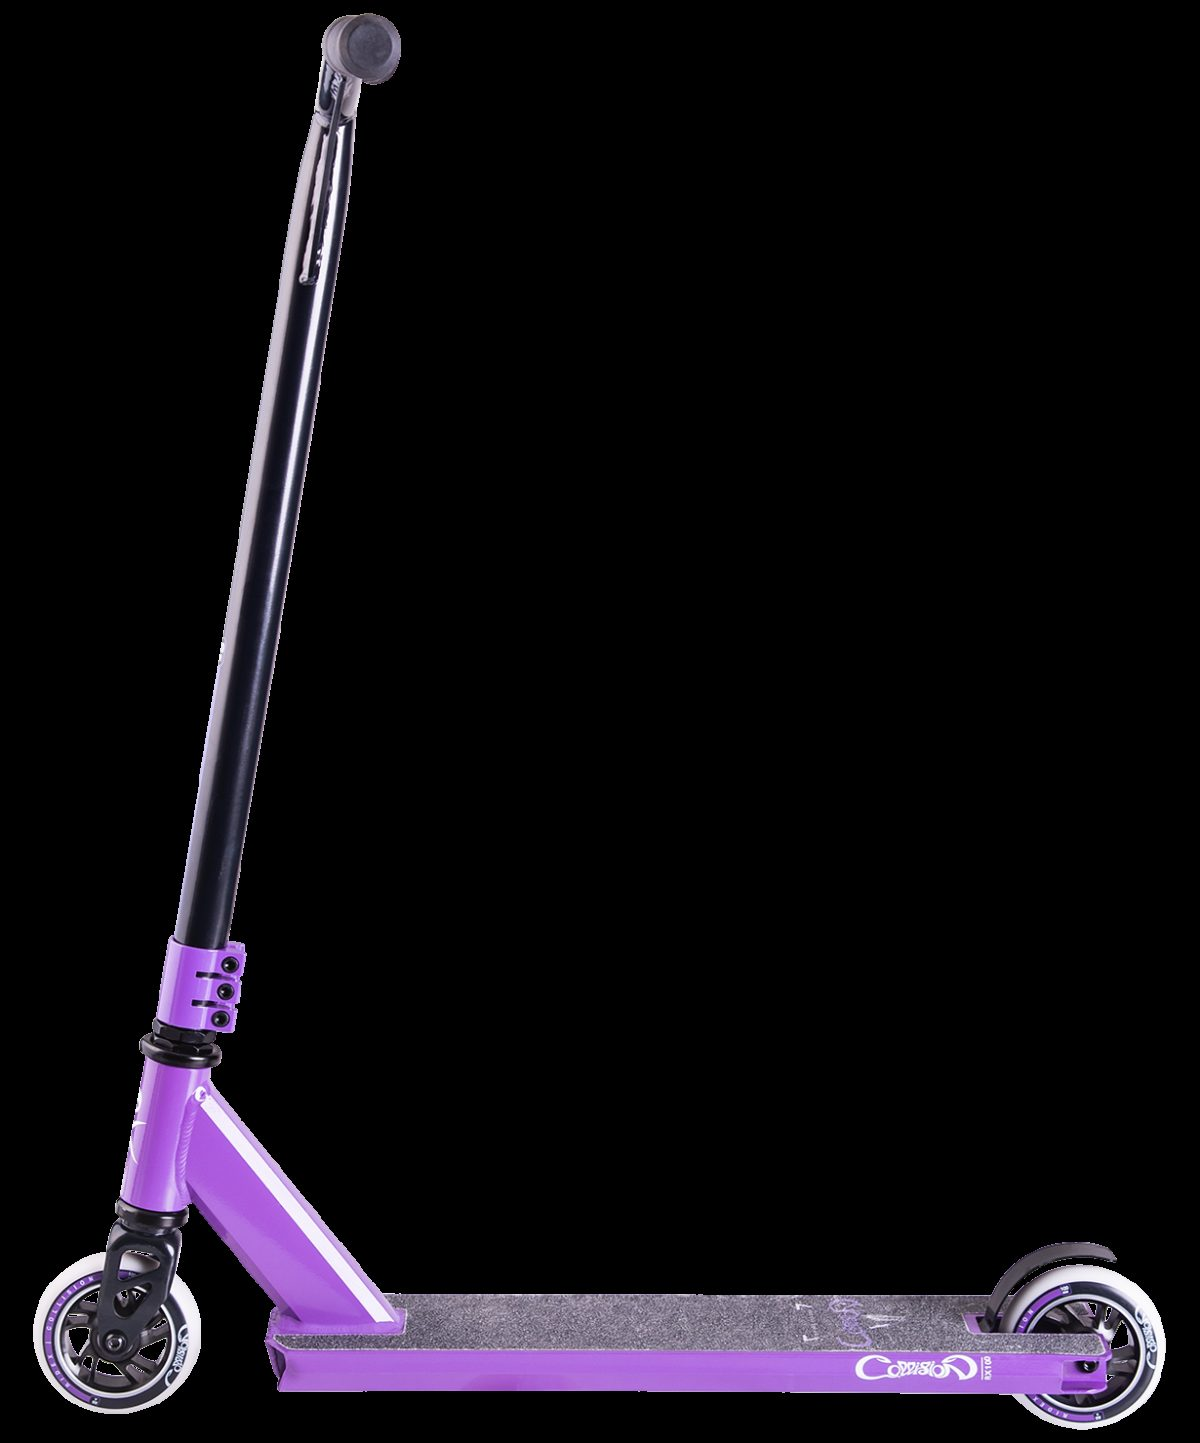 RIDEX Collision Purple самокат трюковый 100 мм - 4